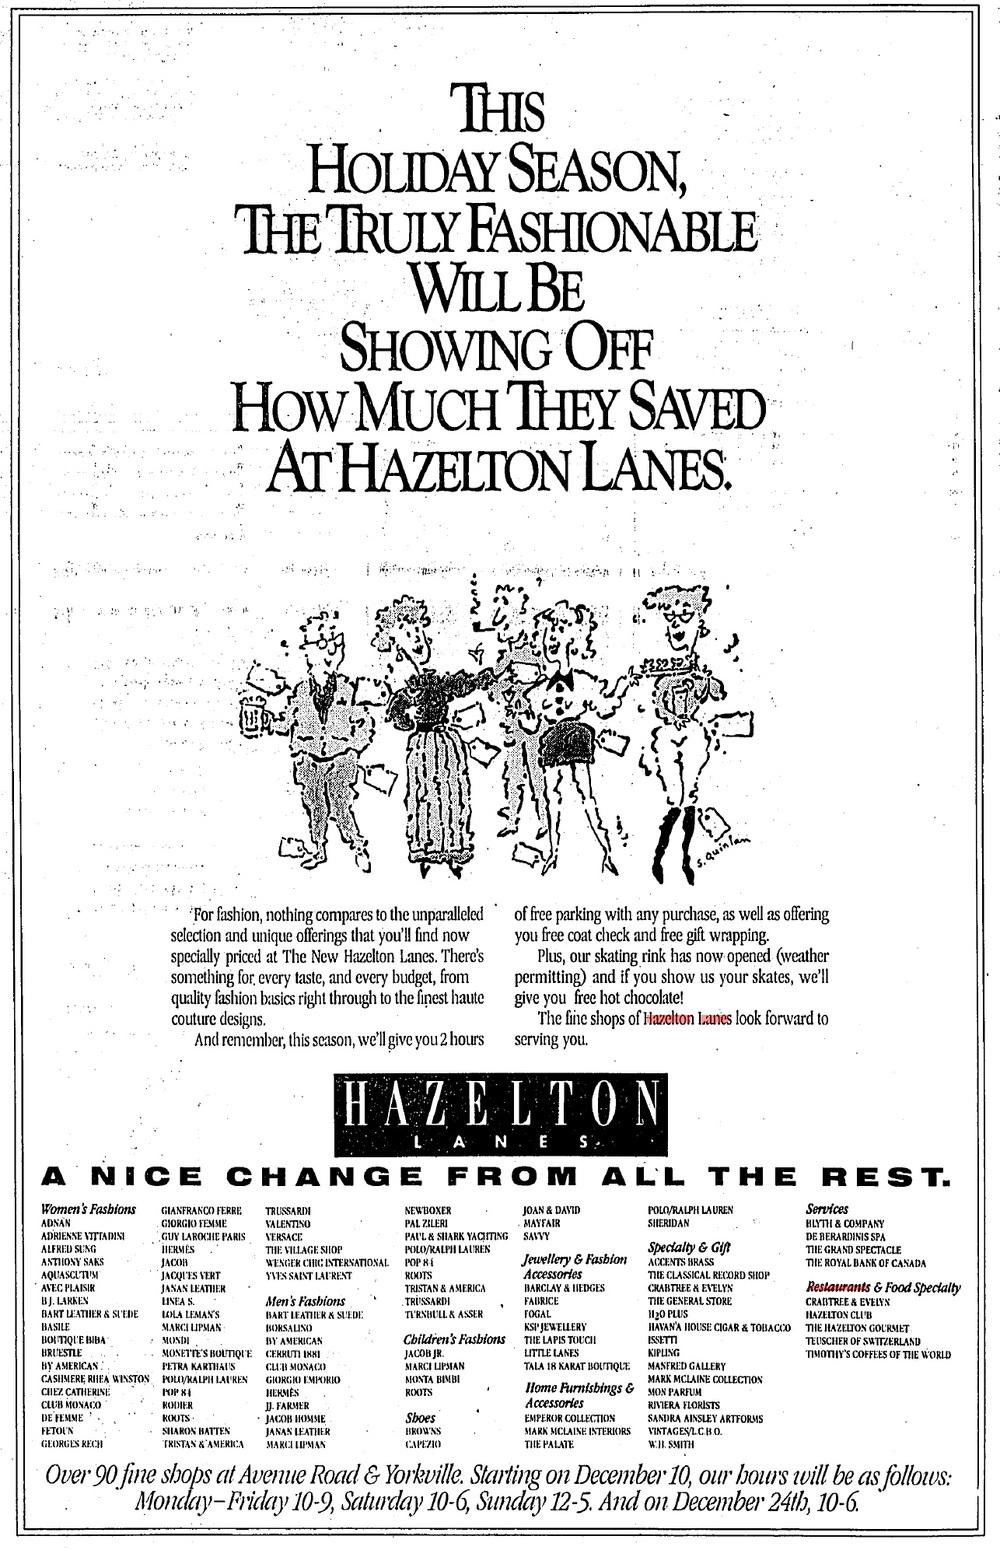 1990 Hazelton Lanes ad via Skeezix, of Urban Toronto.